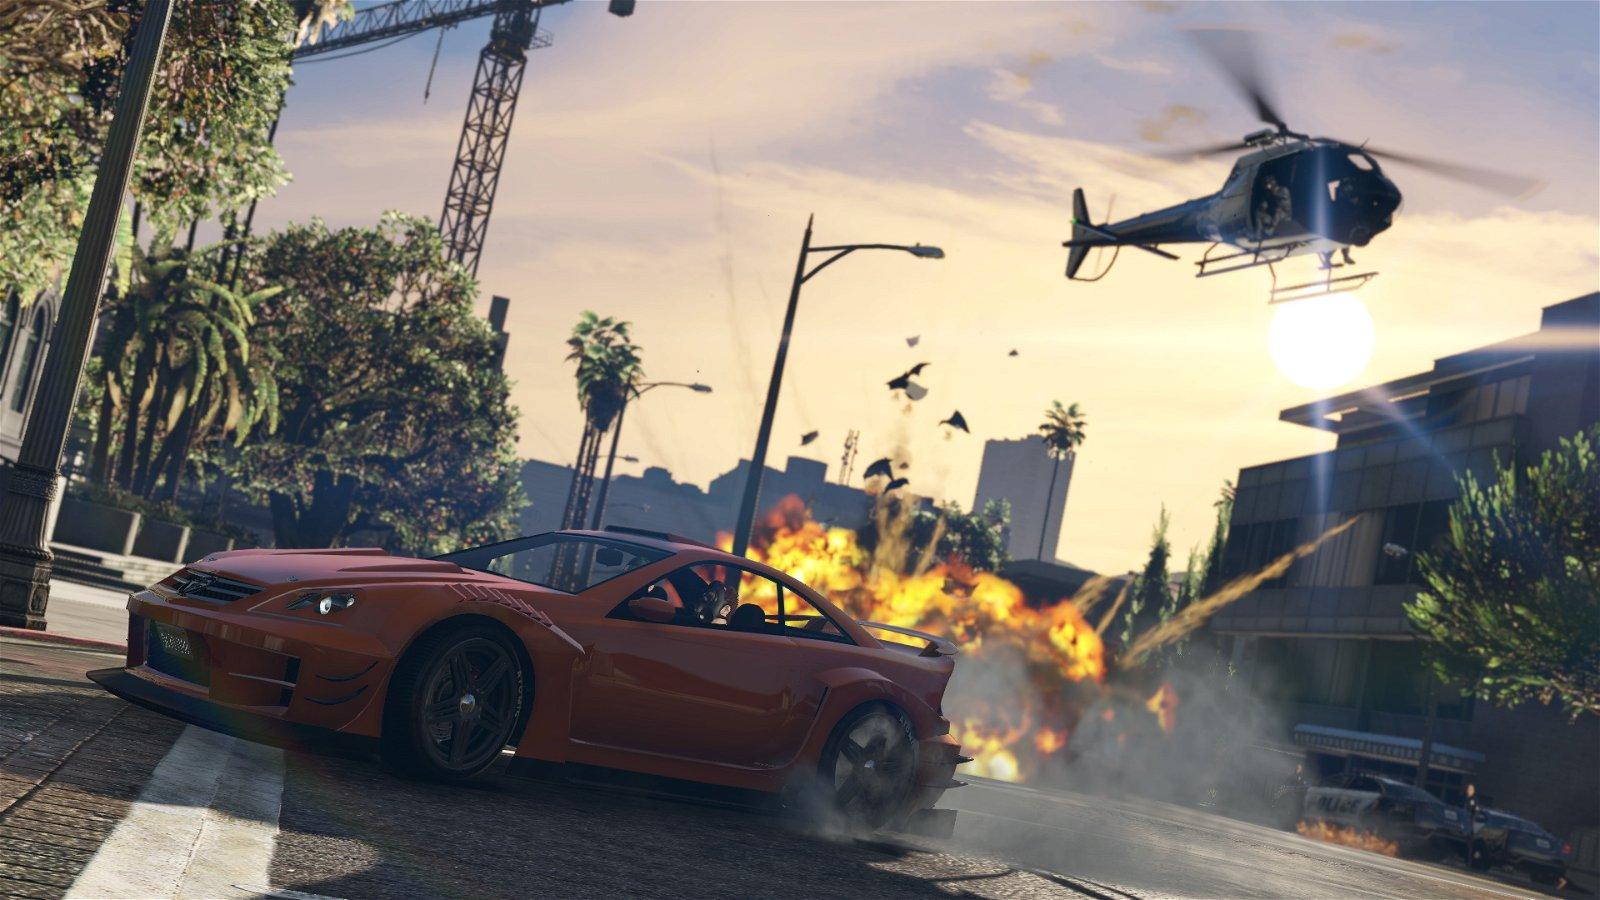 GTA Online Getting Major Expansion in June 1